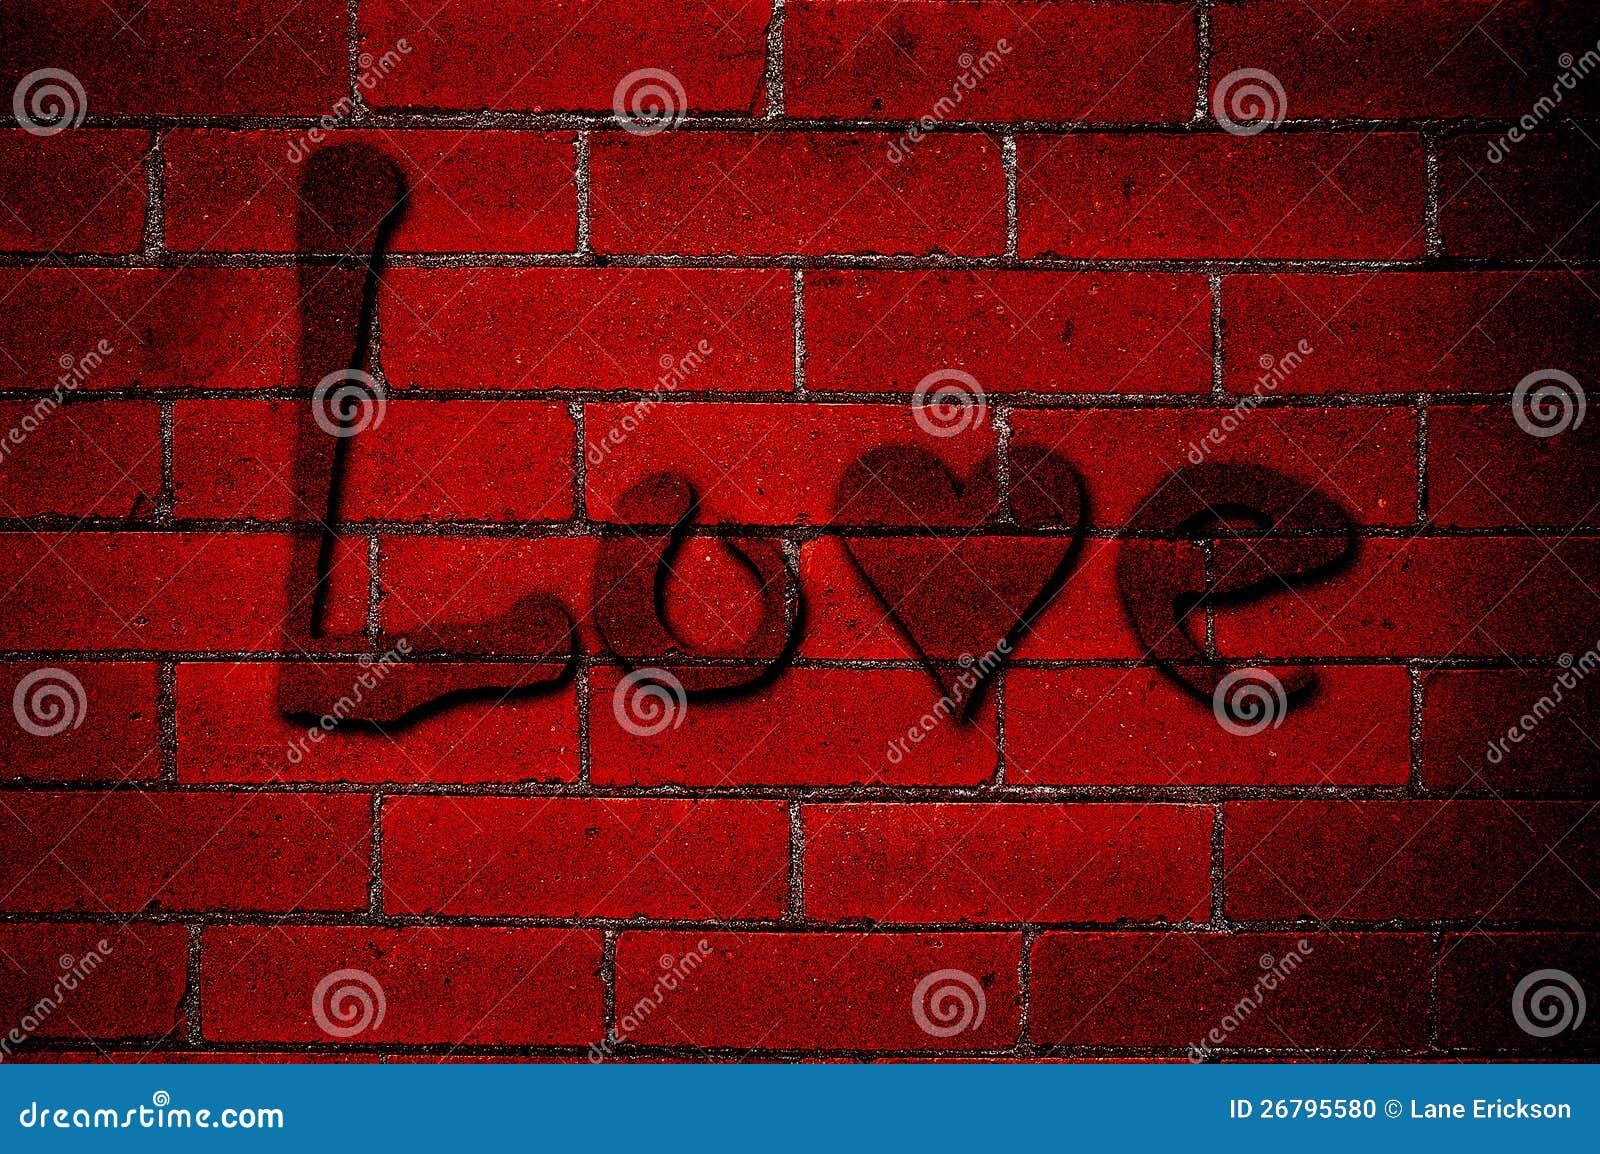 Grafiti wall red - Love Graffiti On Red Brick Wall Stock Photo